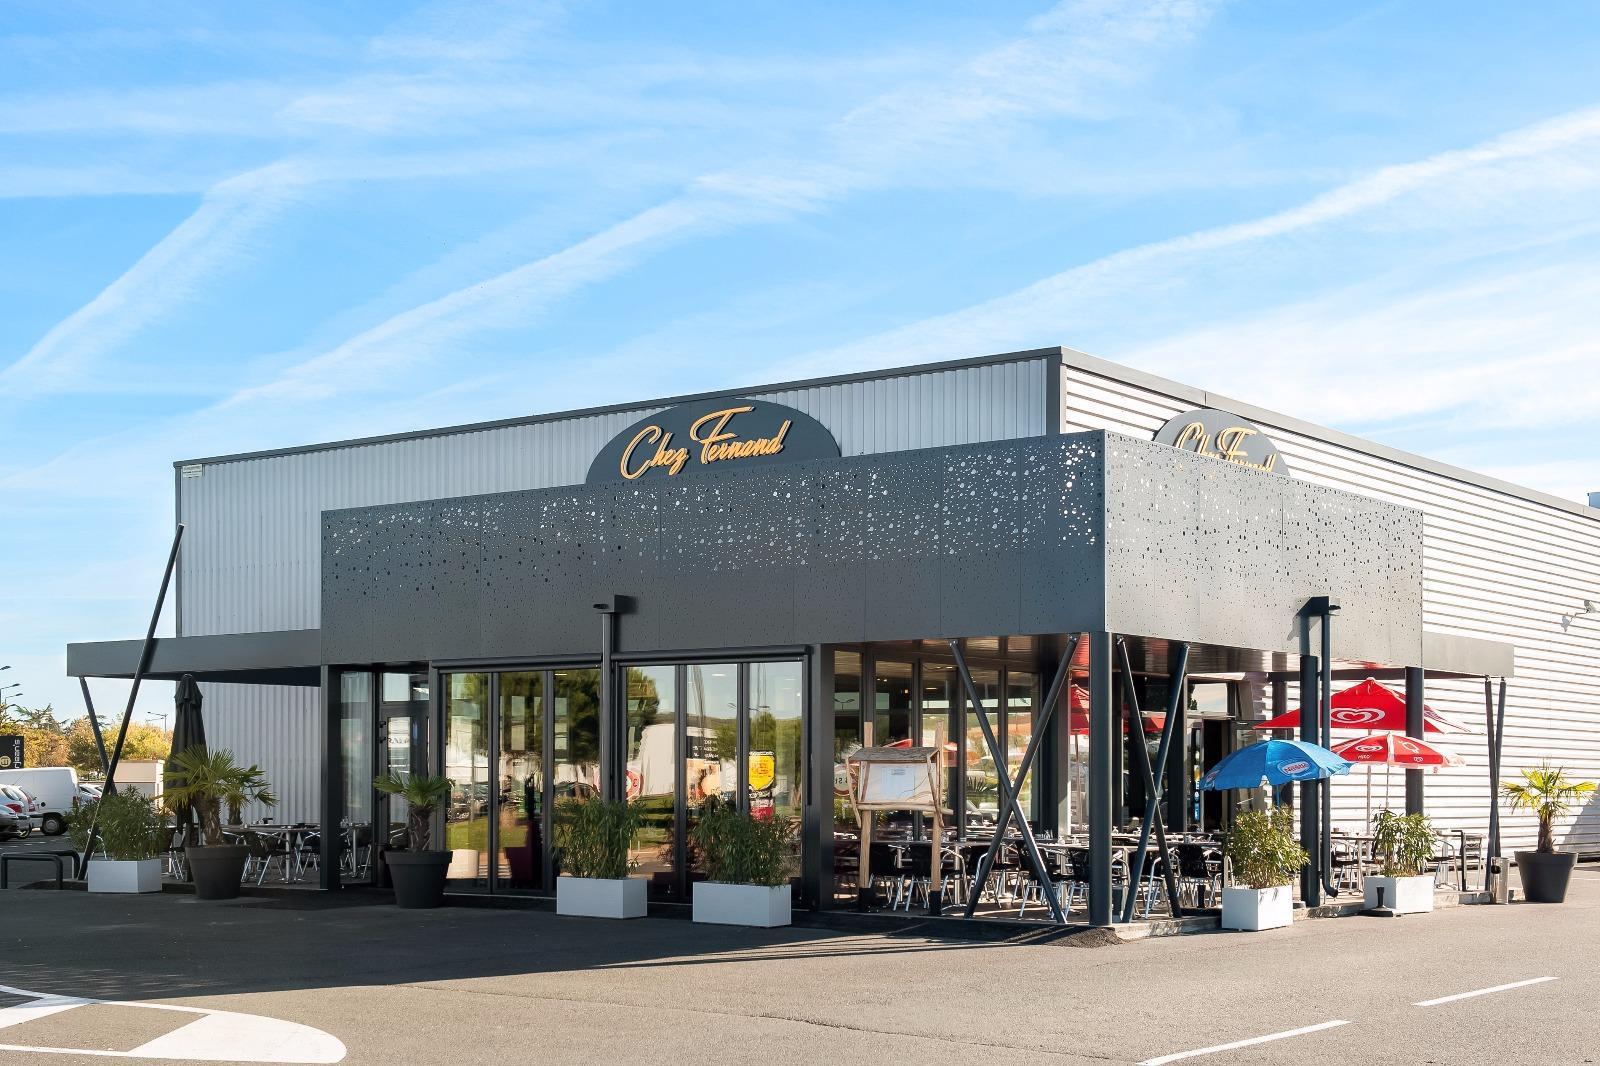 Brasserie Chez Fernand